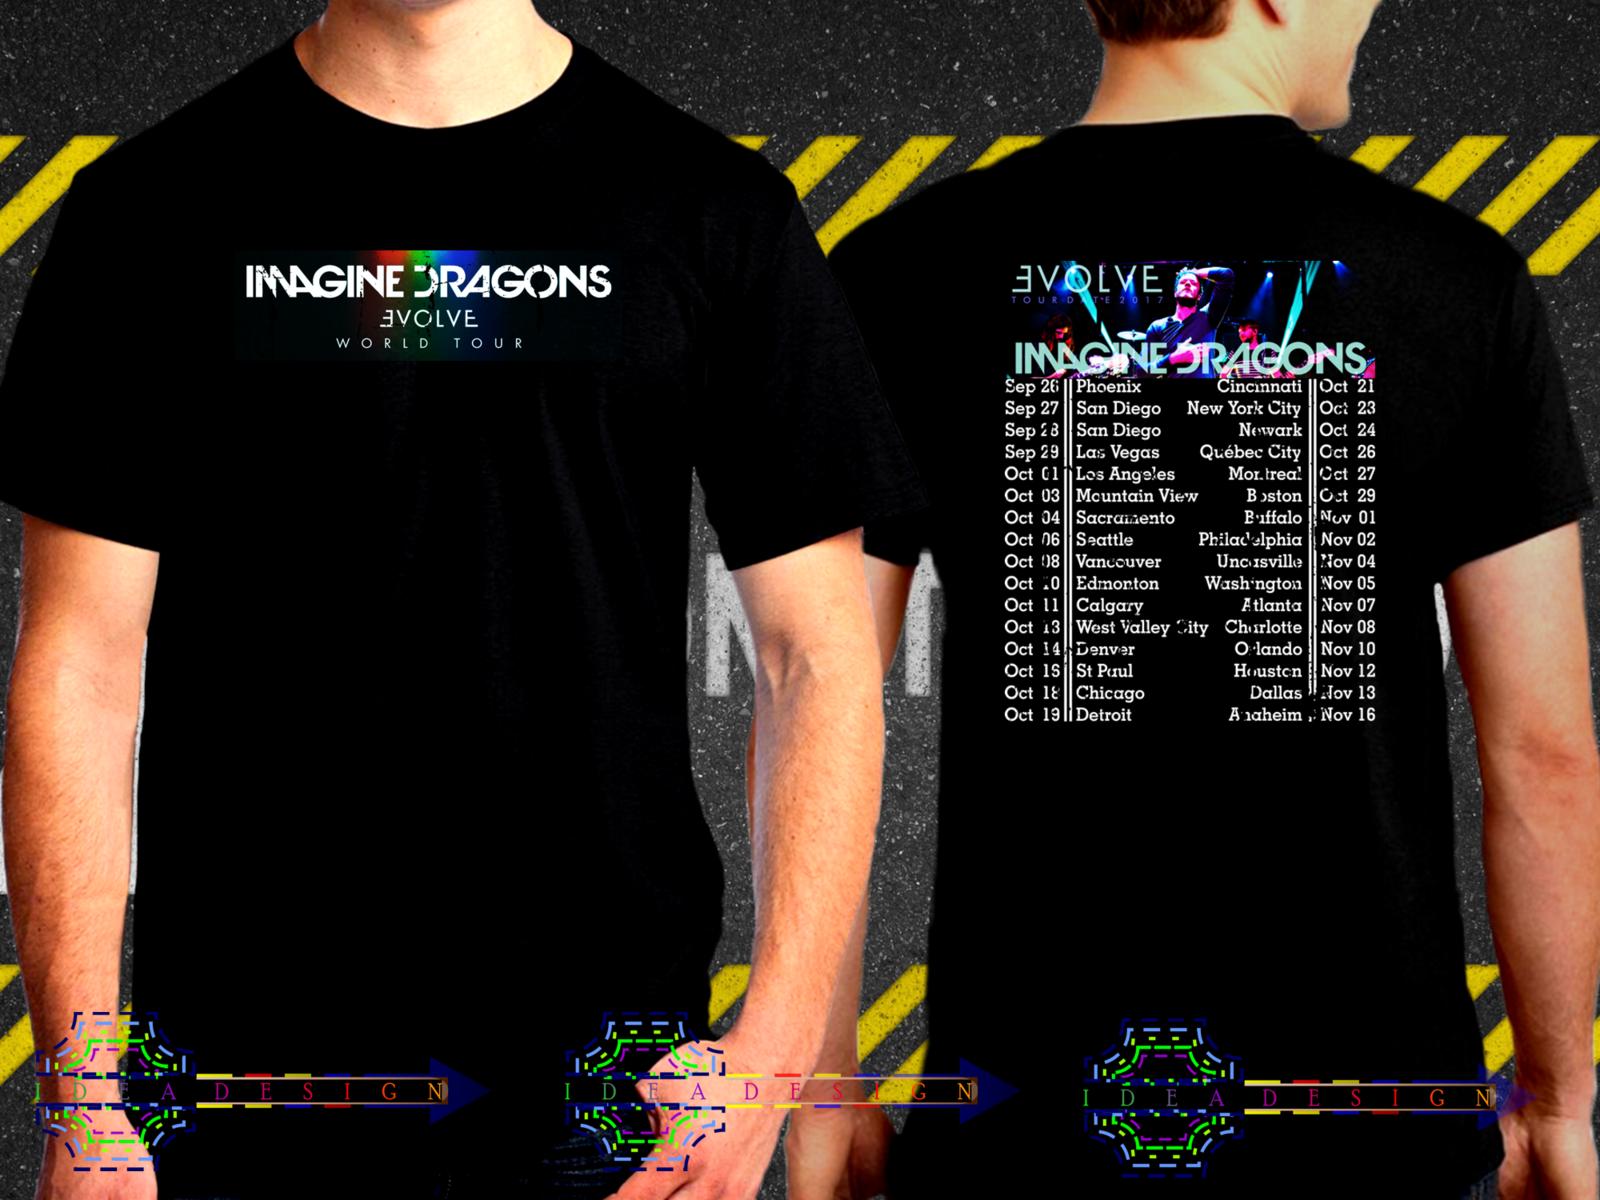 imagine dragons tour 2017 - photo #13